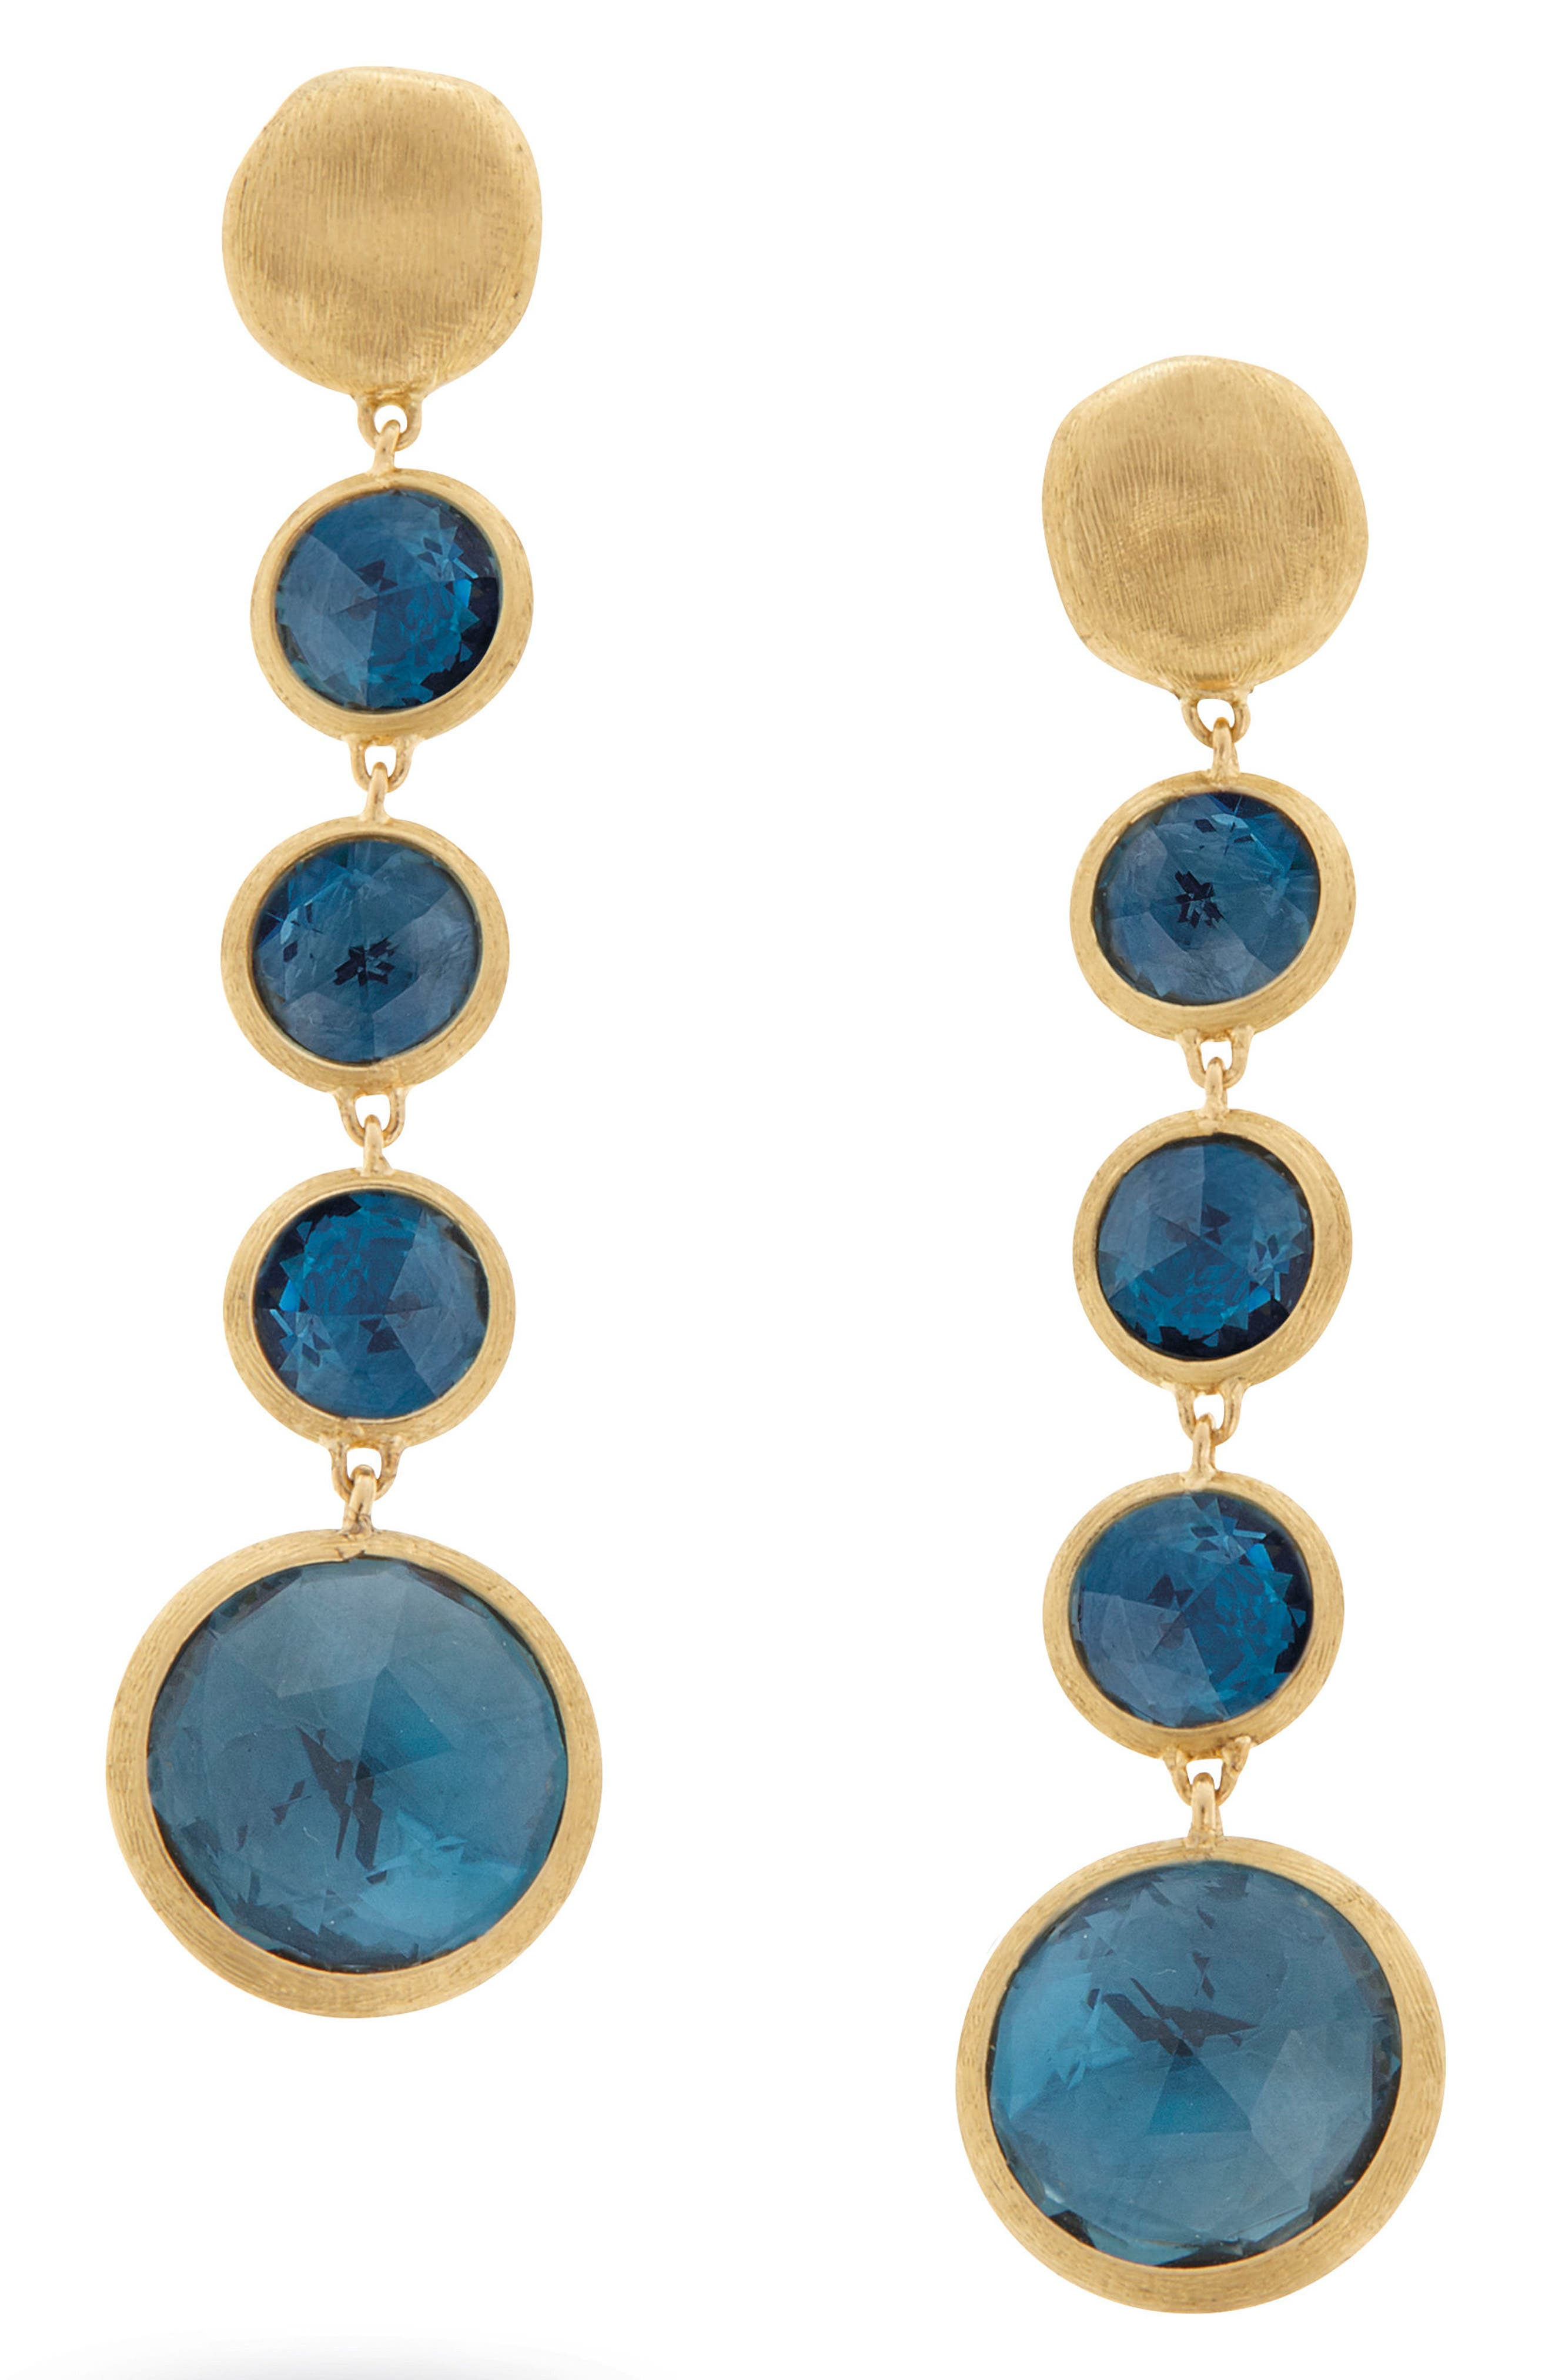 'Jaipur' Semiprecious Stone Linear Earrings,                         Main,                         color, Yellow Gold/ Blue Topaz